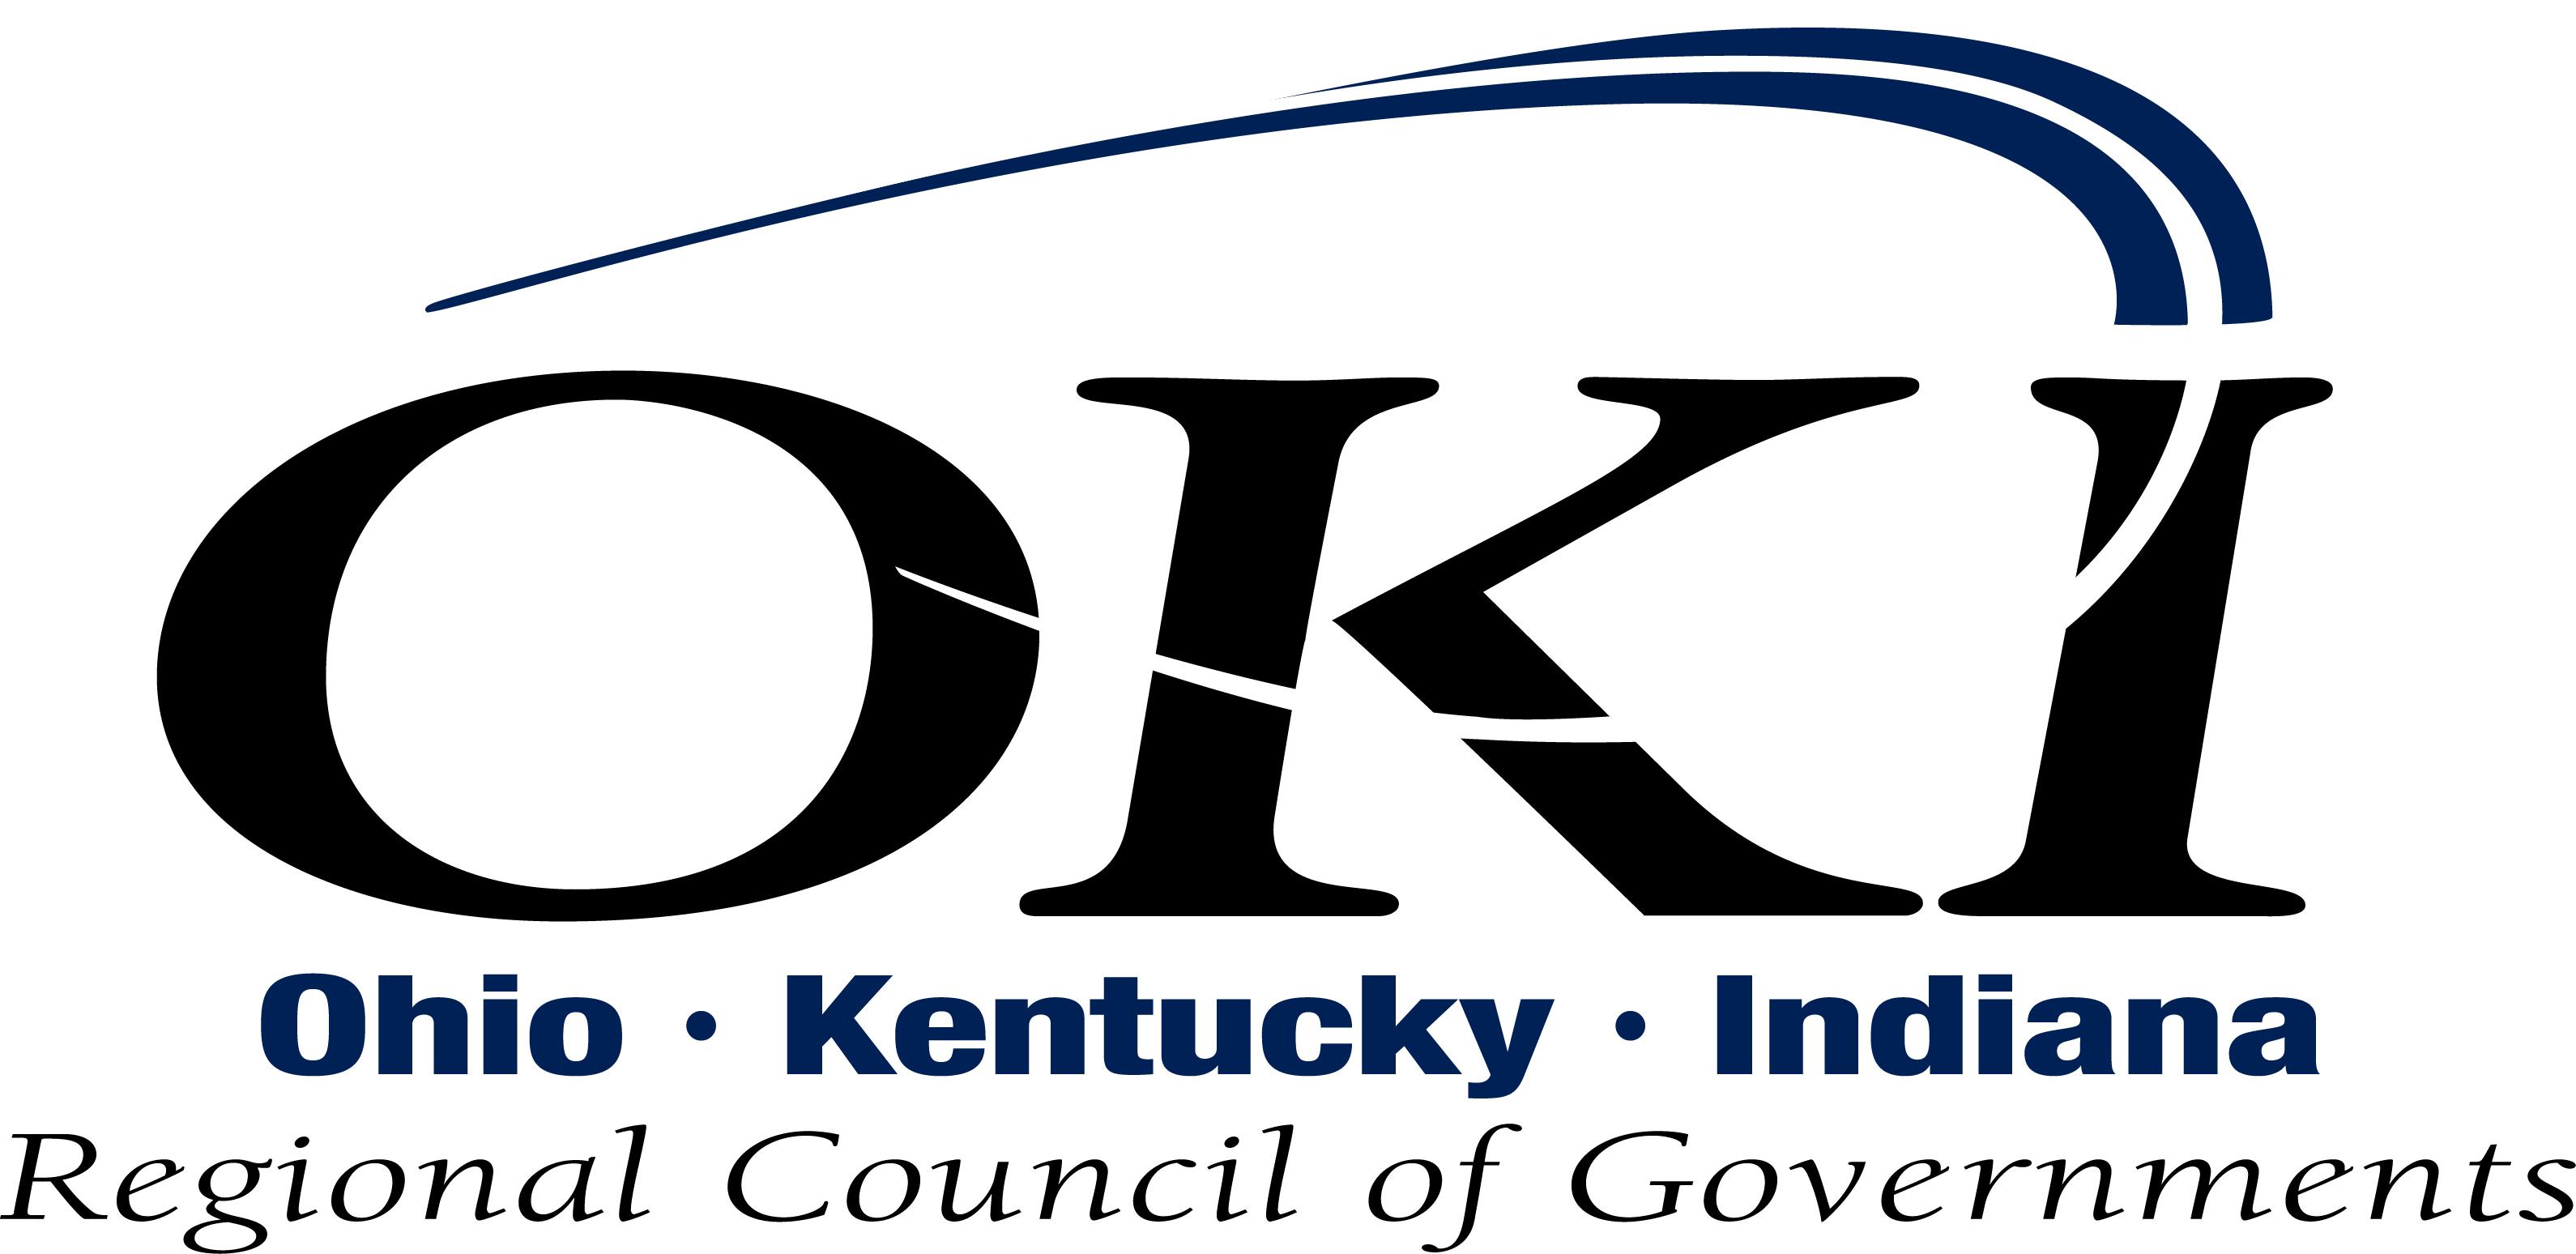 OKI Vector Logo_retouch